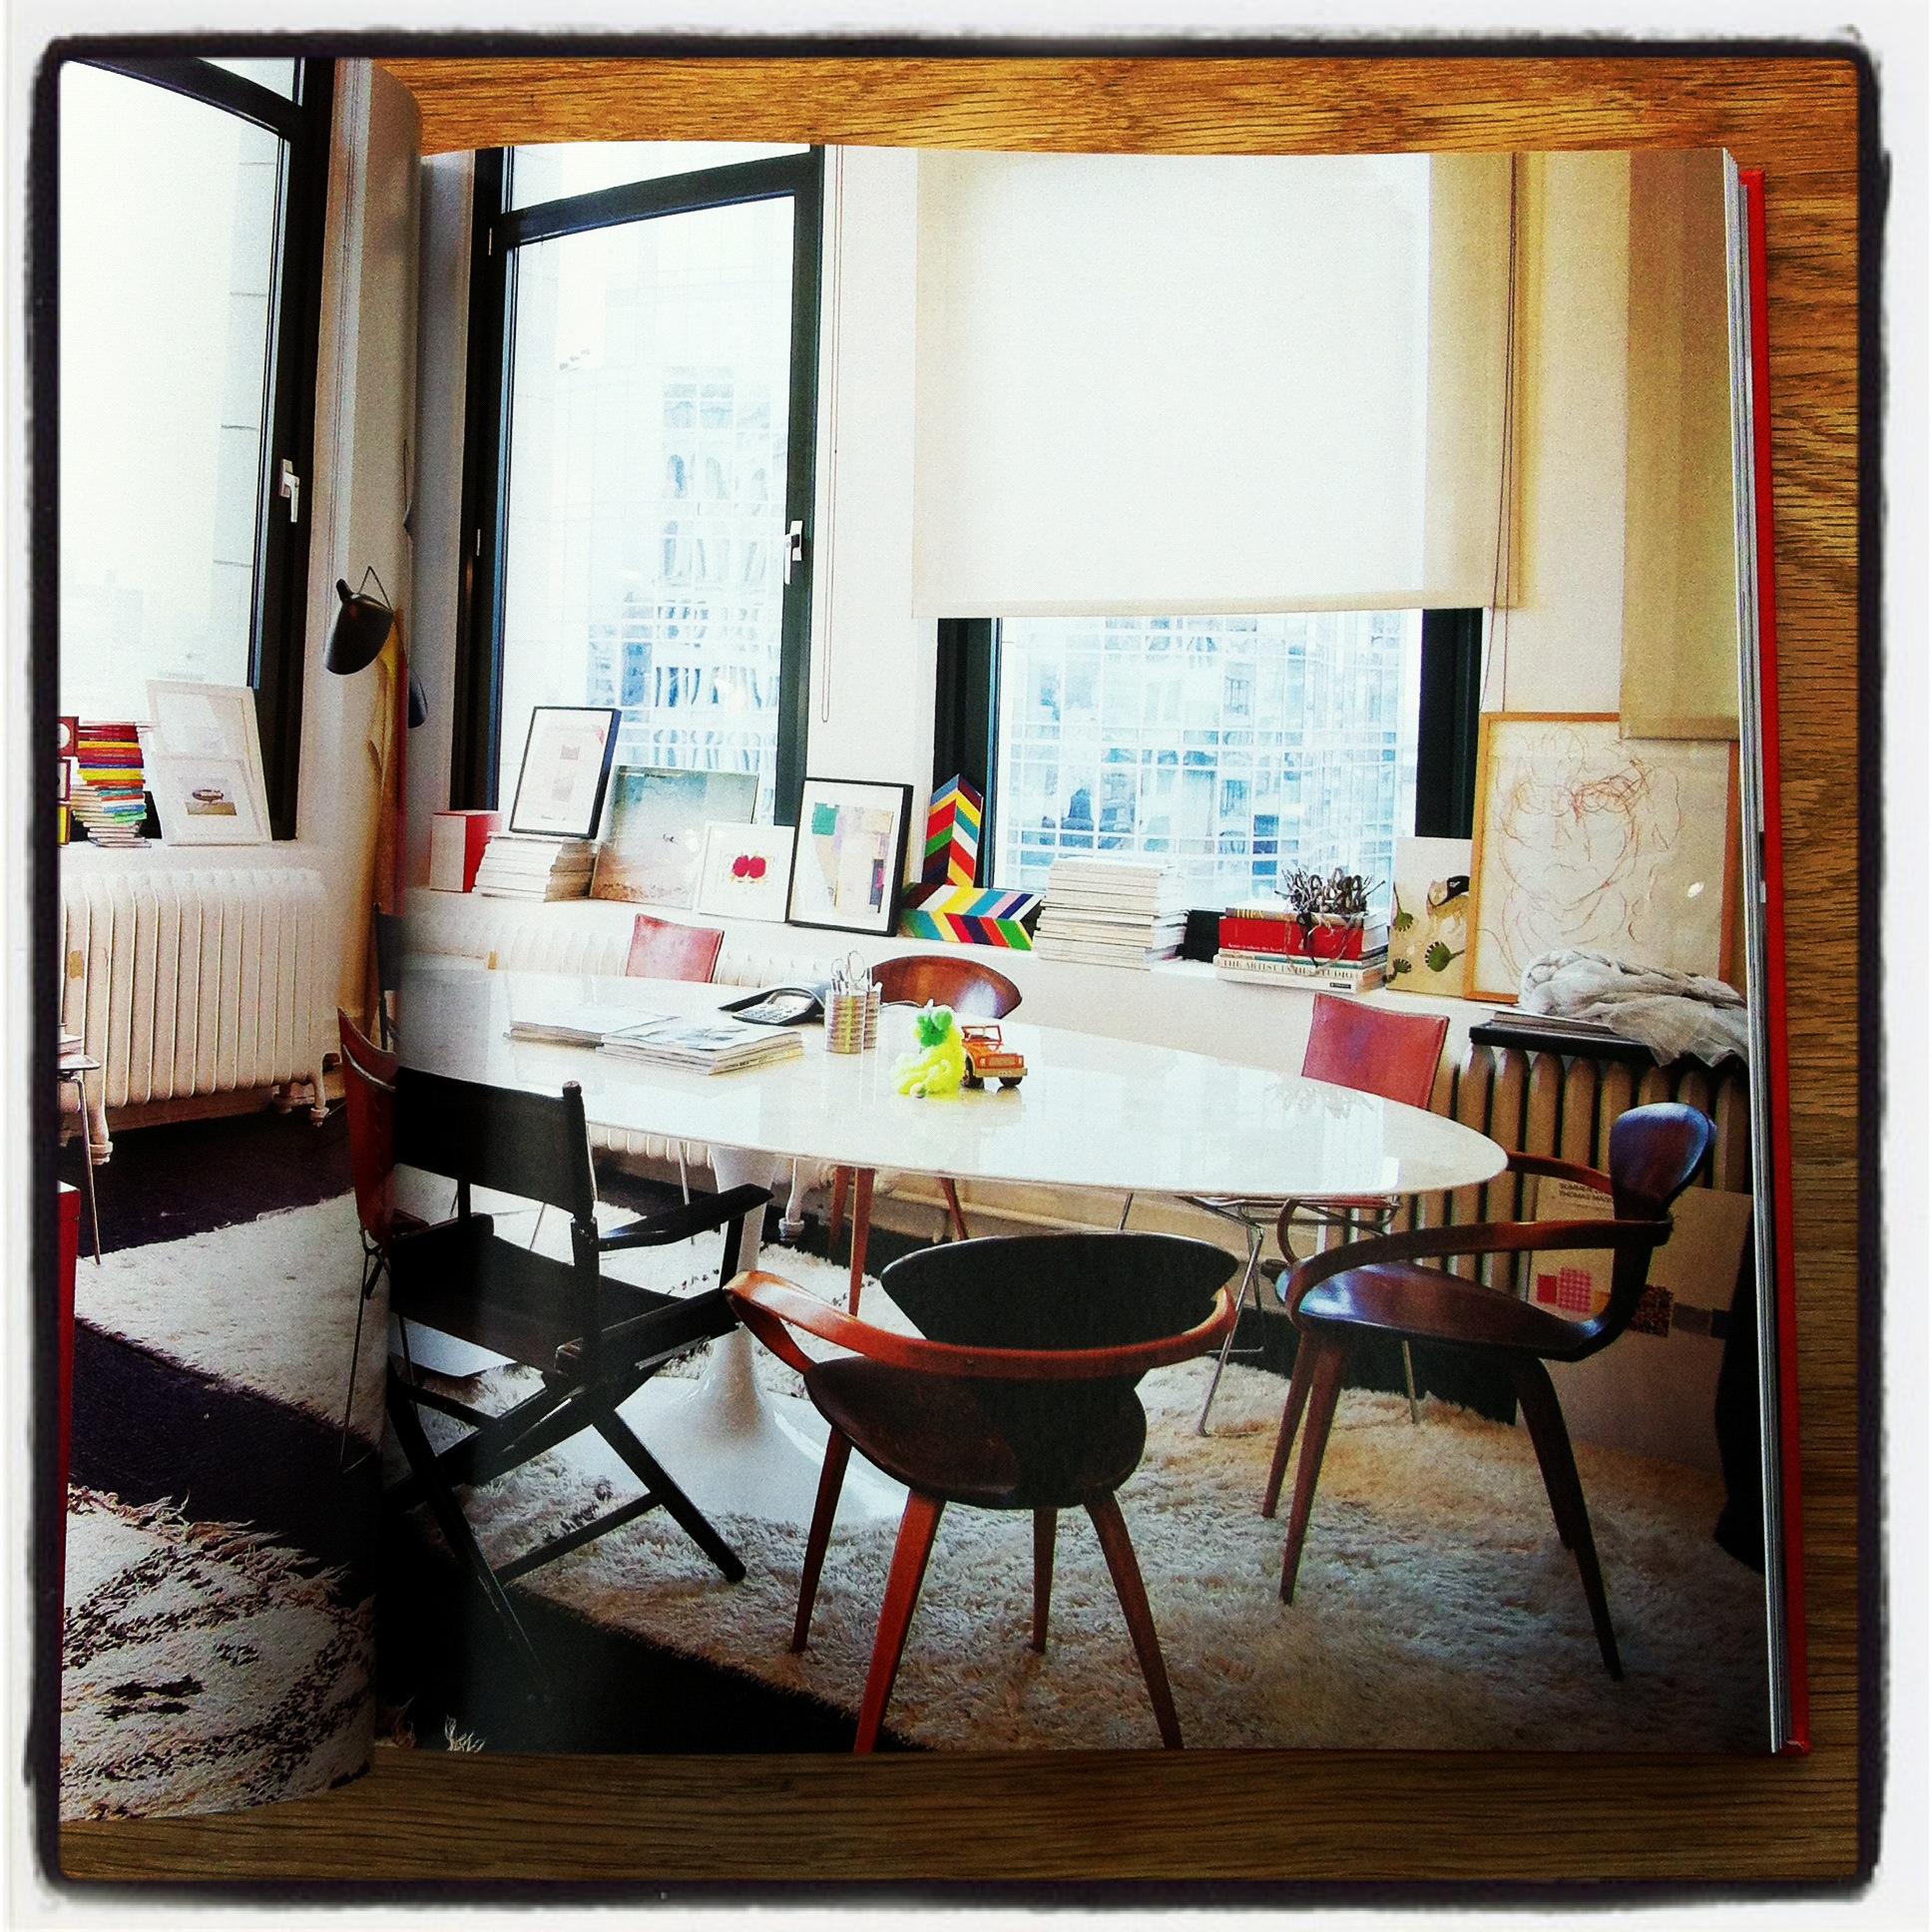 The sleek corner office of Jenna Lyons, Creative Director, J.Crew